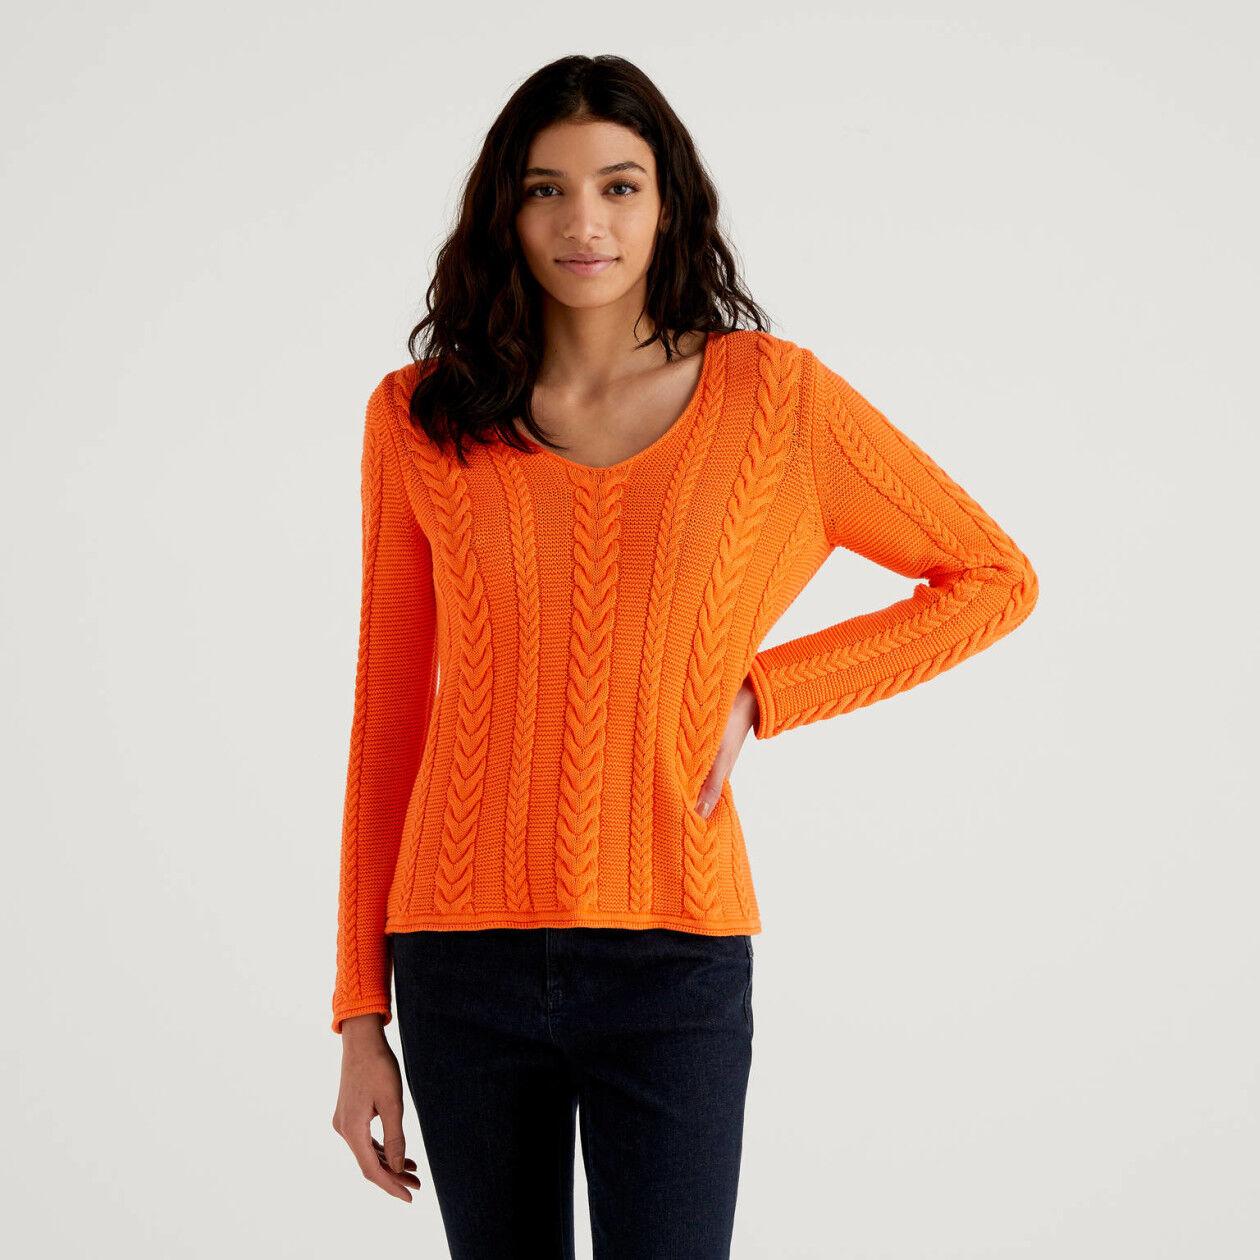 Pullover mit V-Ausschnitt und Flechtmuster